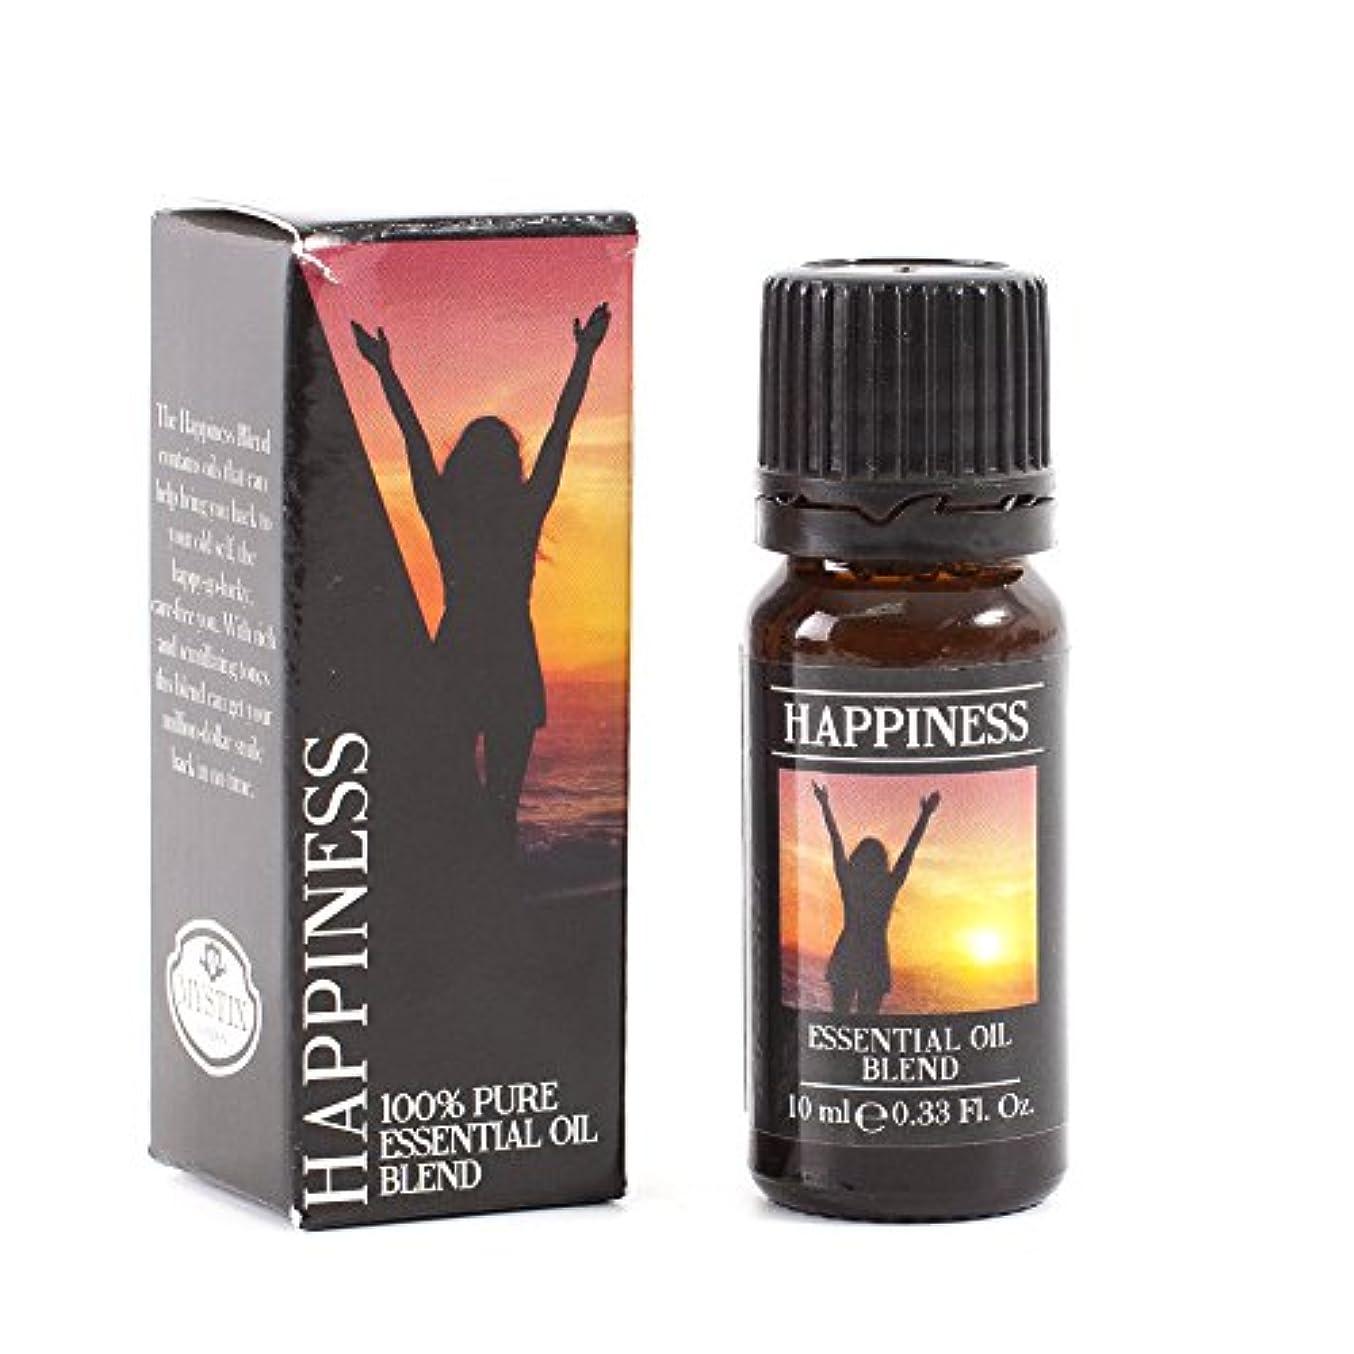 Mystix London   Happiness Essential Oil Blend - 10ml - 100% Pure